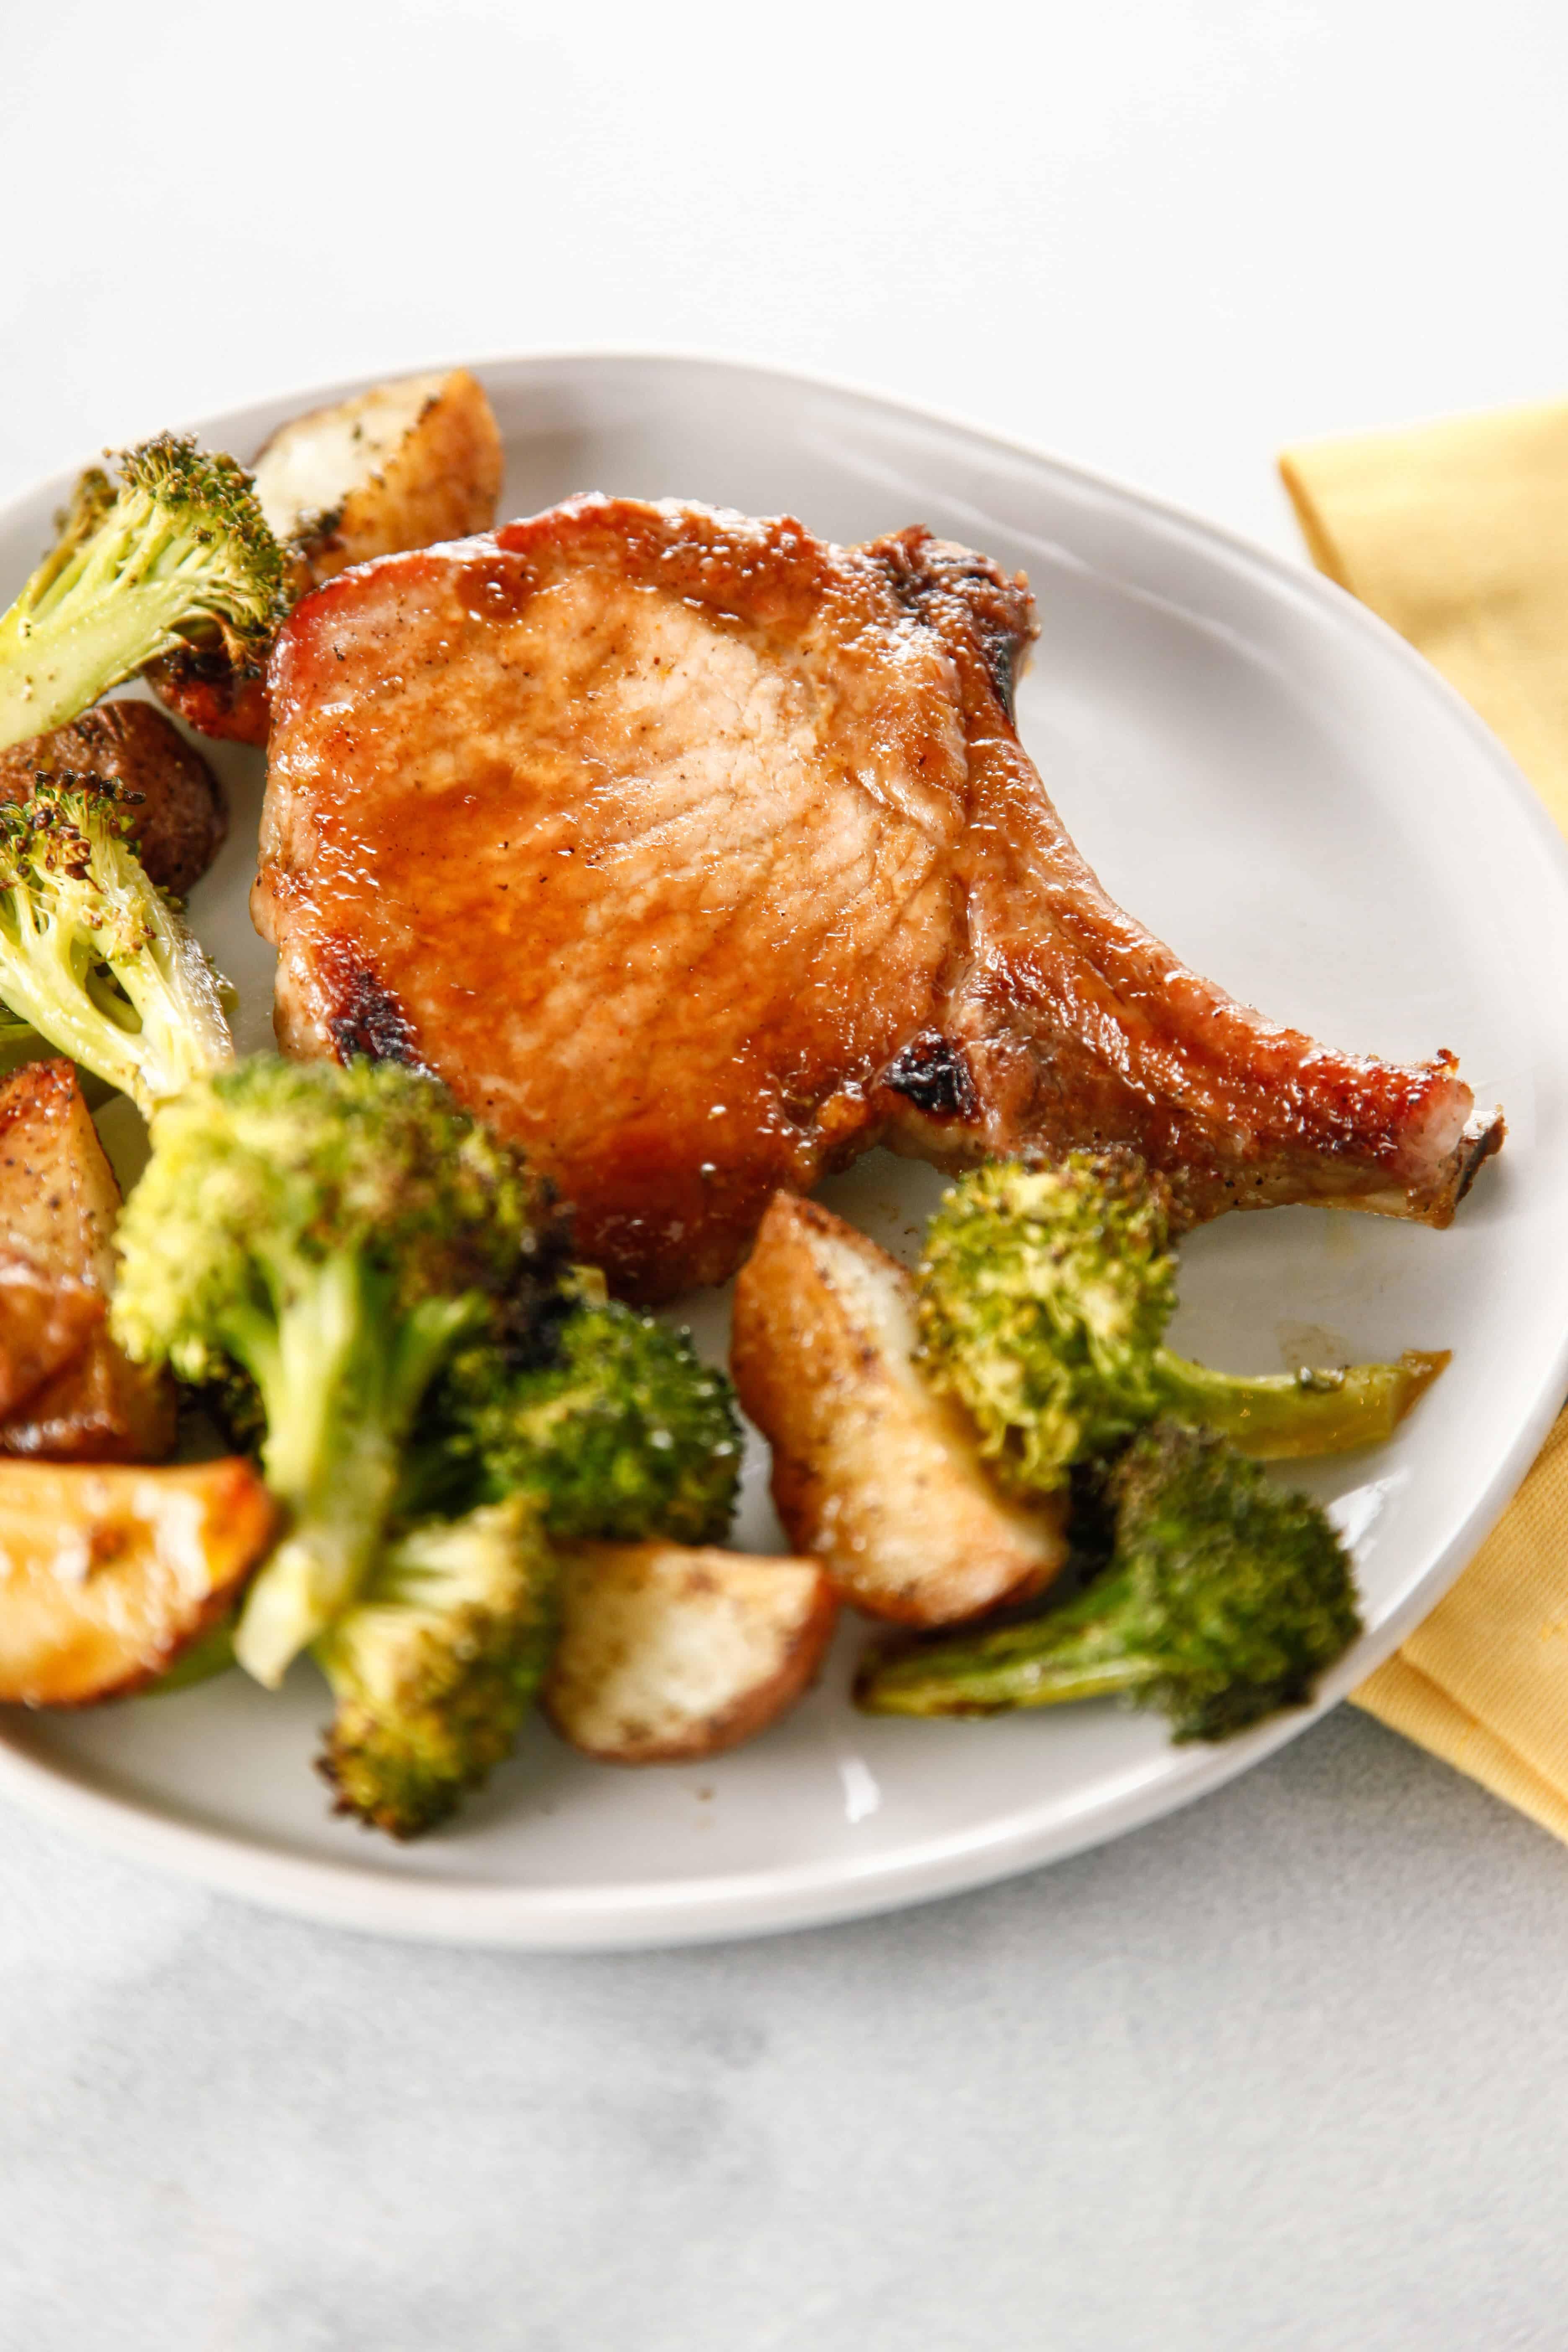 Sheet Pan Marinated Pork Chops and Veggies